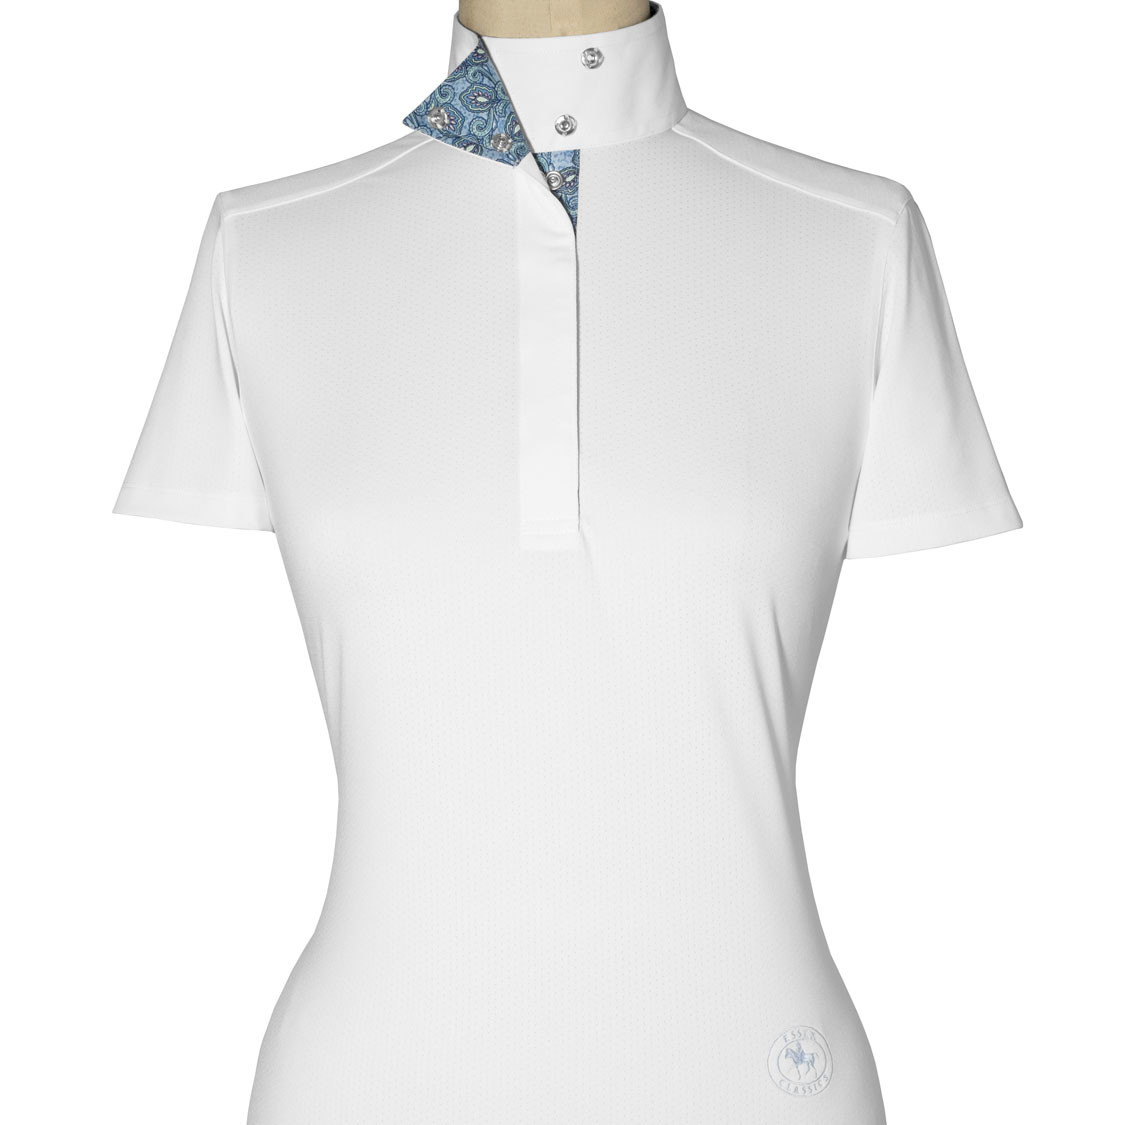 "Essex Essex ""Paisley"" Ladies Talent Yarn Wrap Collar Short Sleeve Show Shirt"